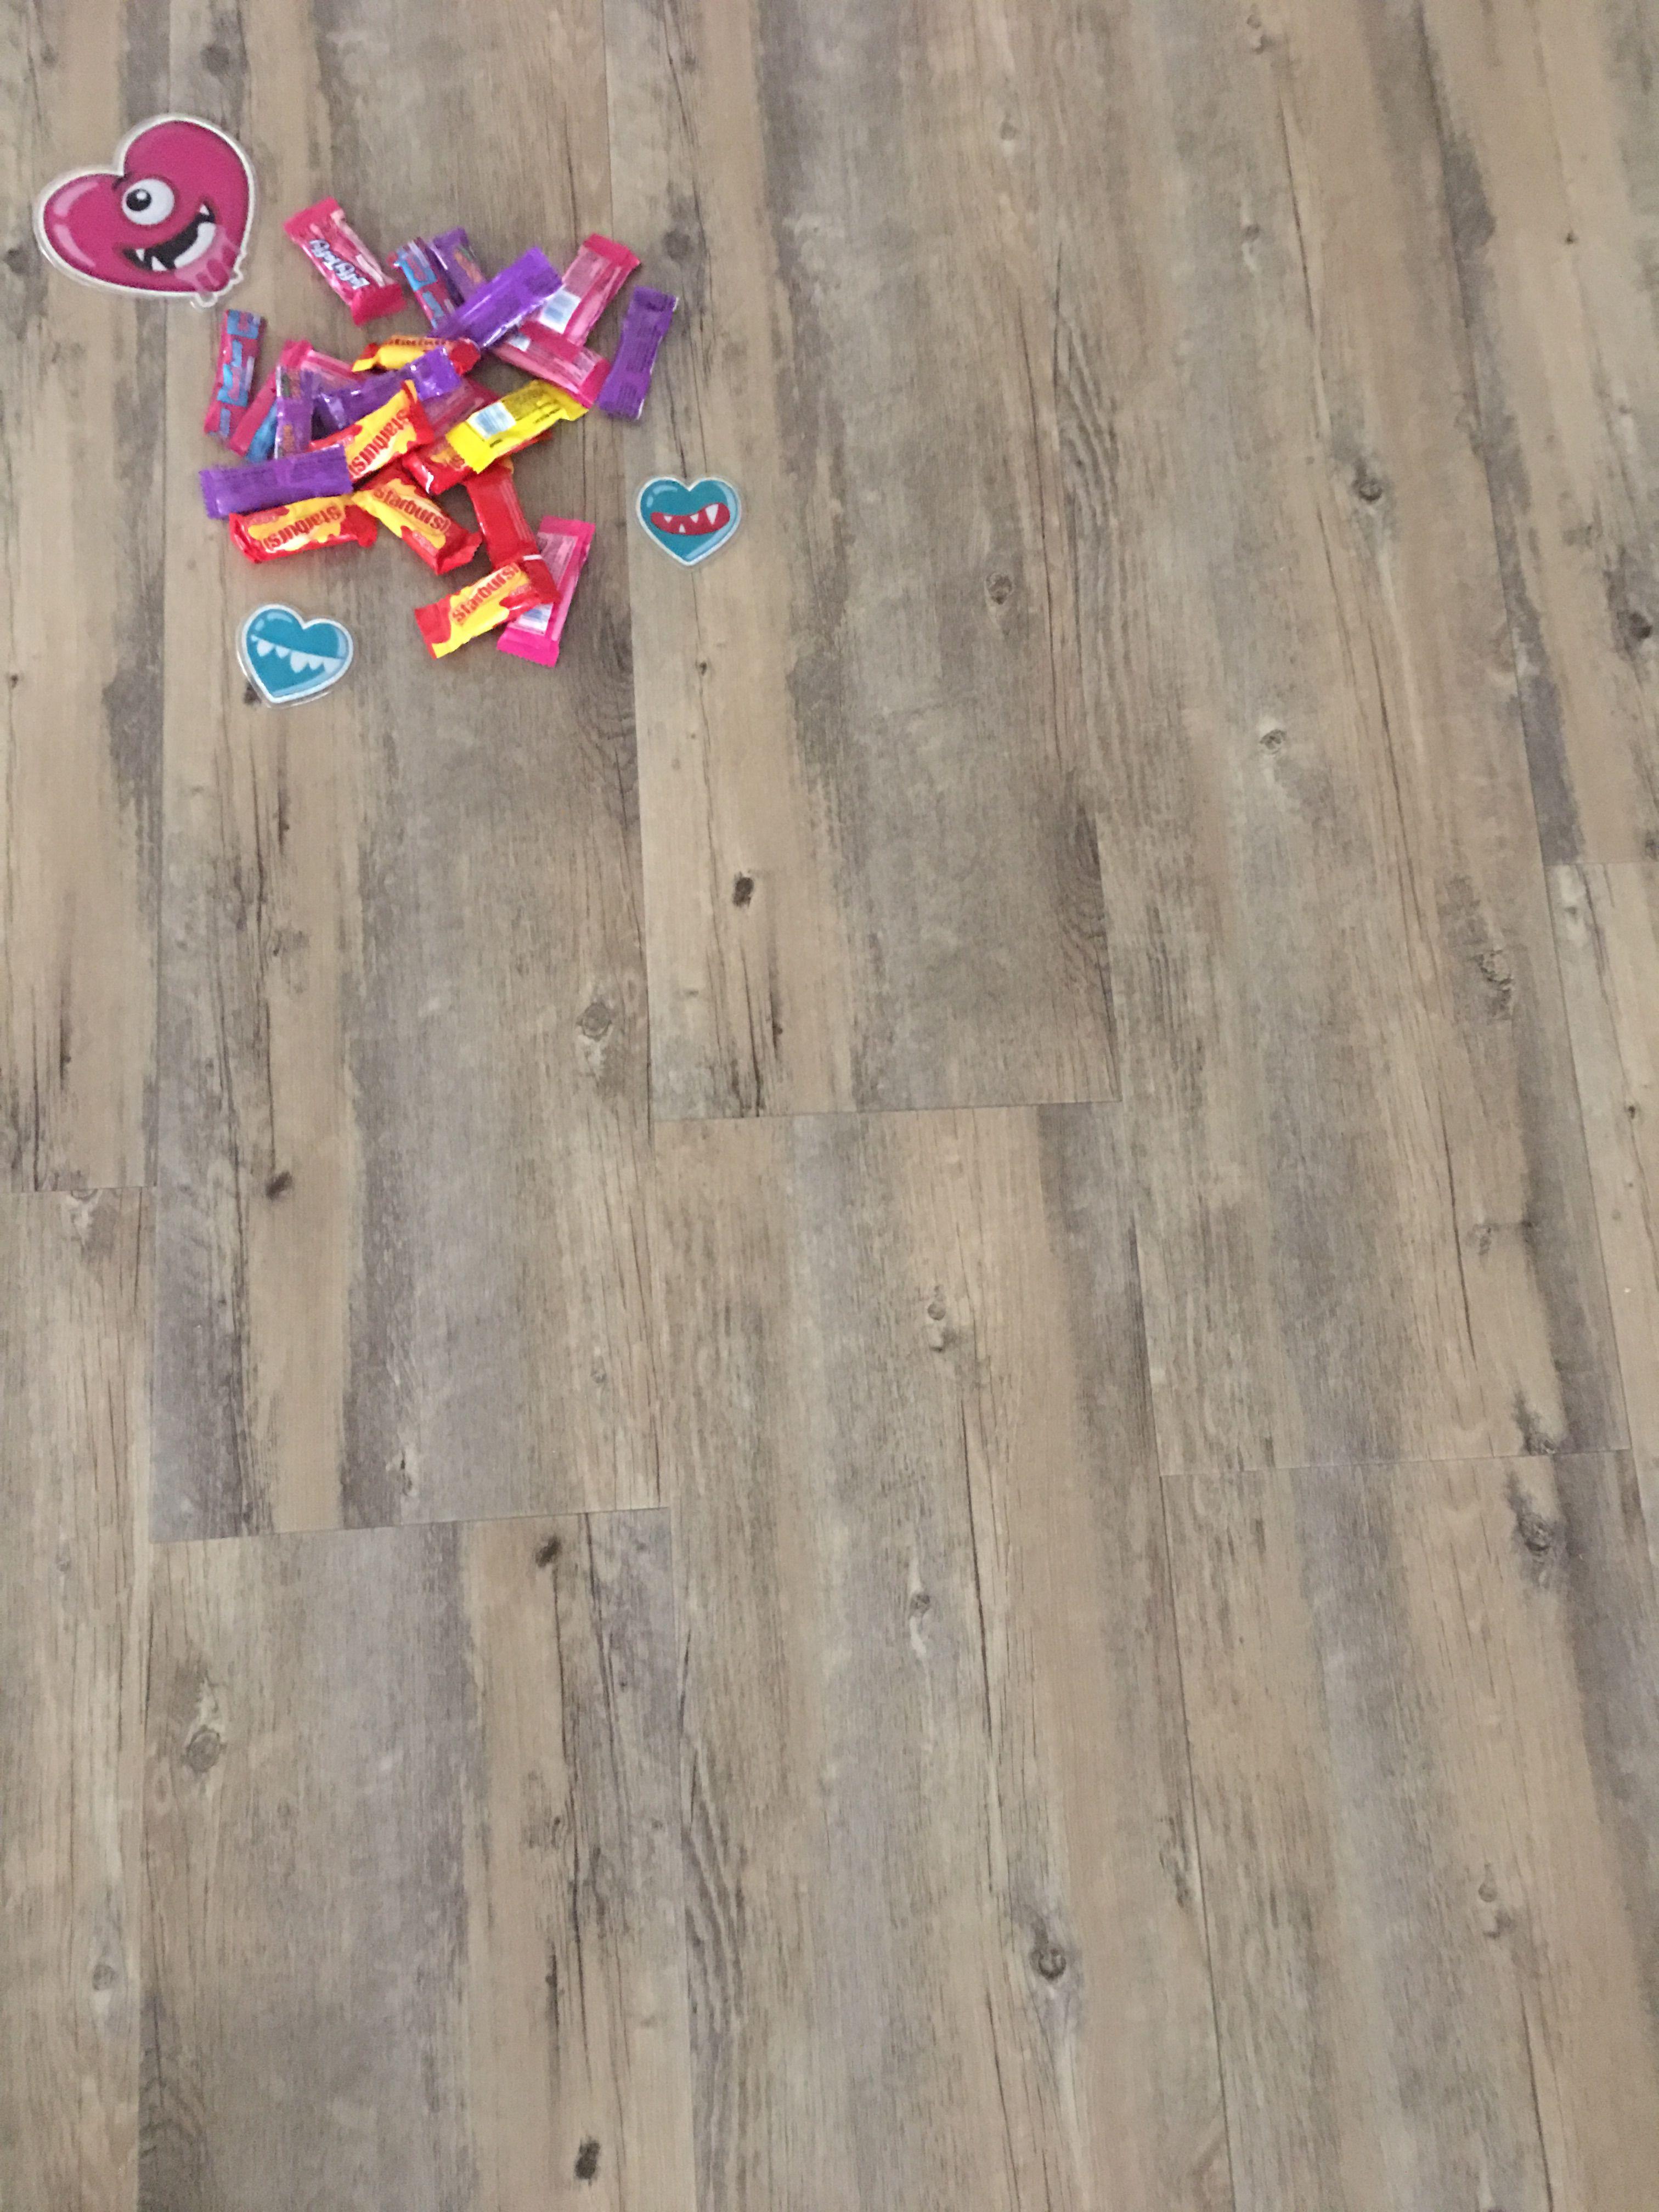 New Centurion Flooring Distributors Lucius Collection Auburn Dynasty 3019 1 23 80 Sqft Carton 6 5x9x48 Inch Beautiful Flooring Flooring Store Luxury Vinyl